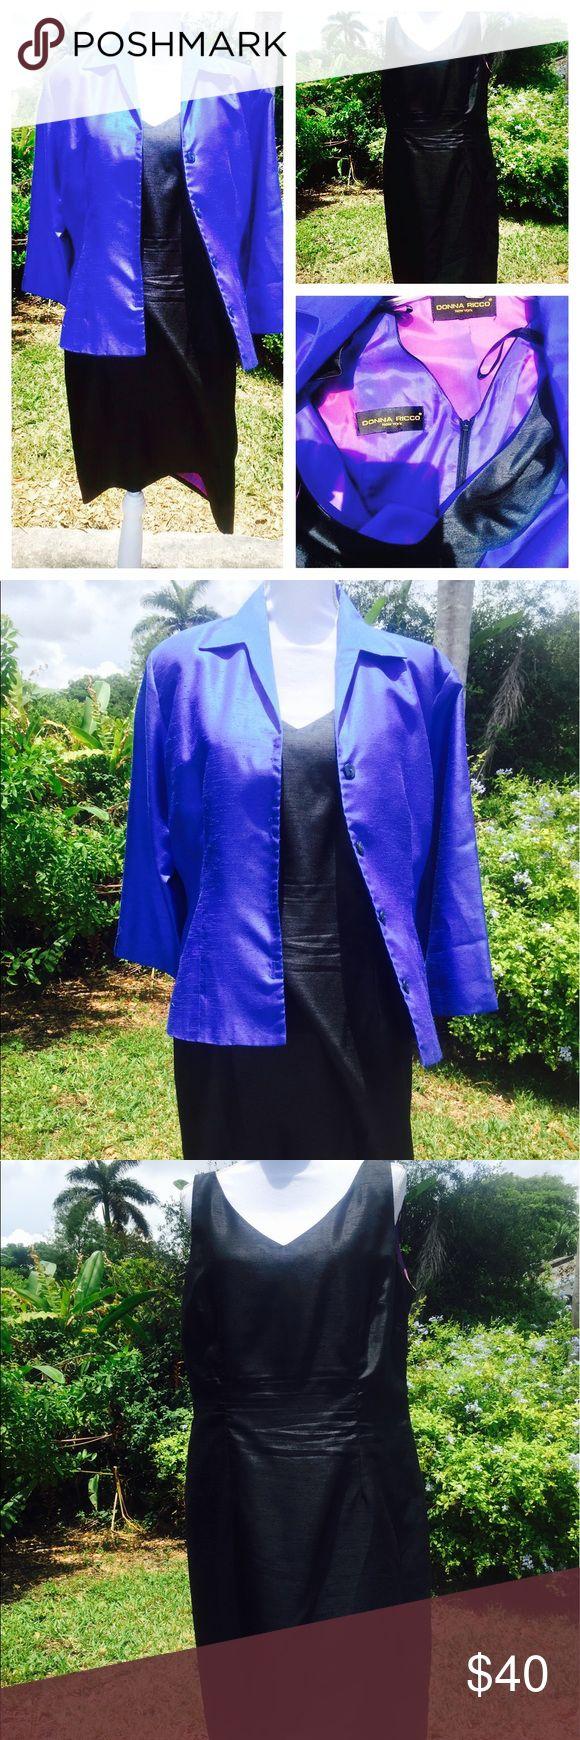 Donna Ricco 100% silk dress blue cover size L Donna Ricco 100% silk dress blue cover size L.  39 inches in length, 32 inches in waist, 19.5 inches in Arm Donna Ricco Dresses